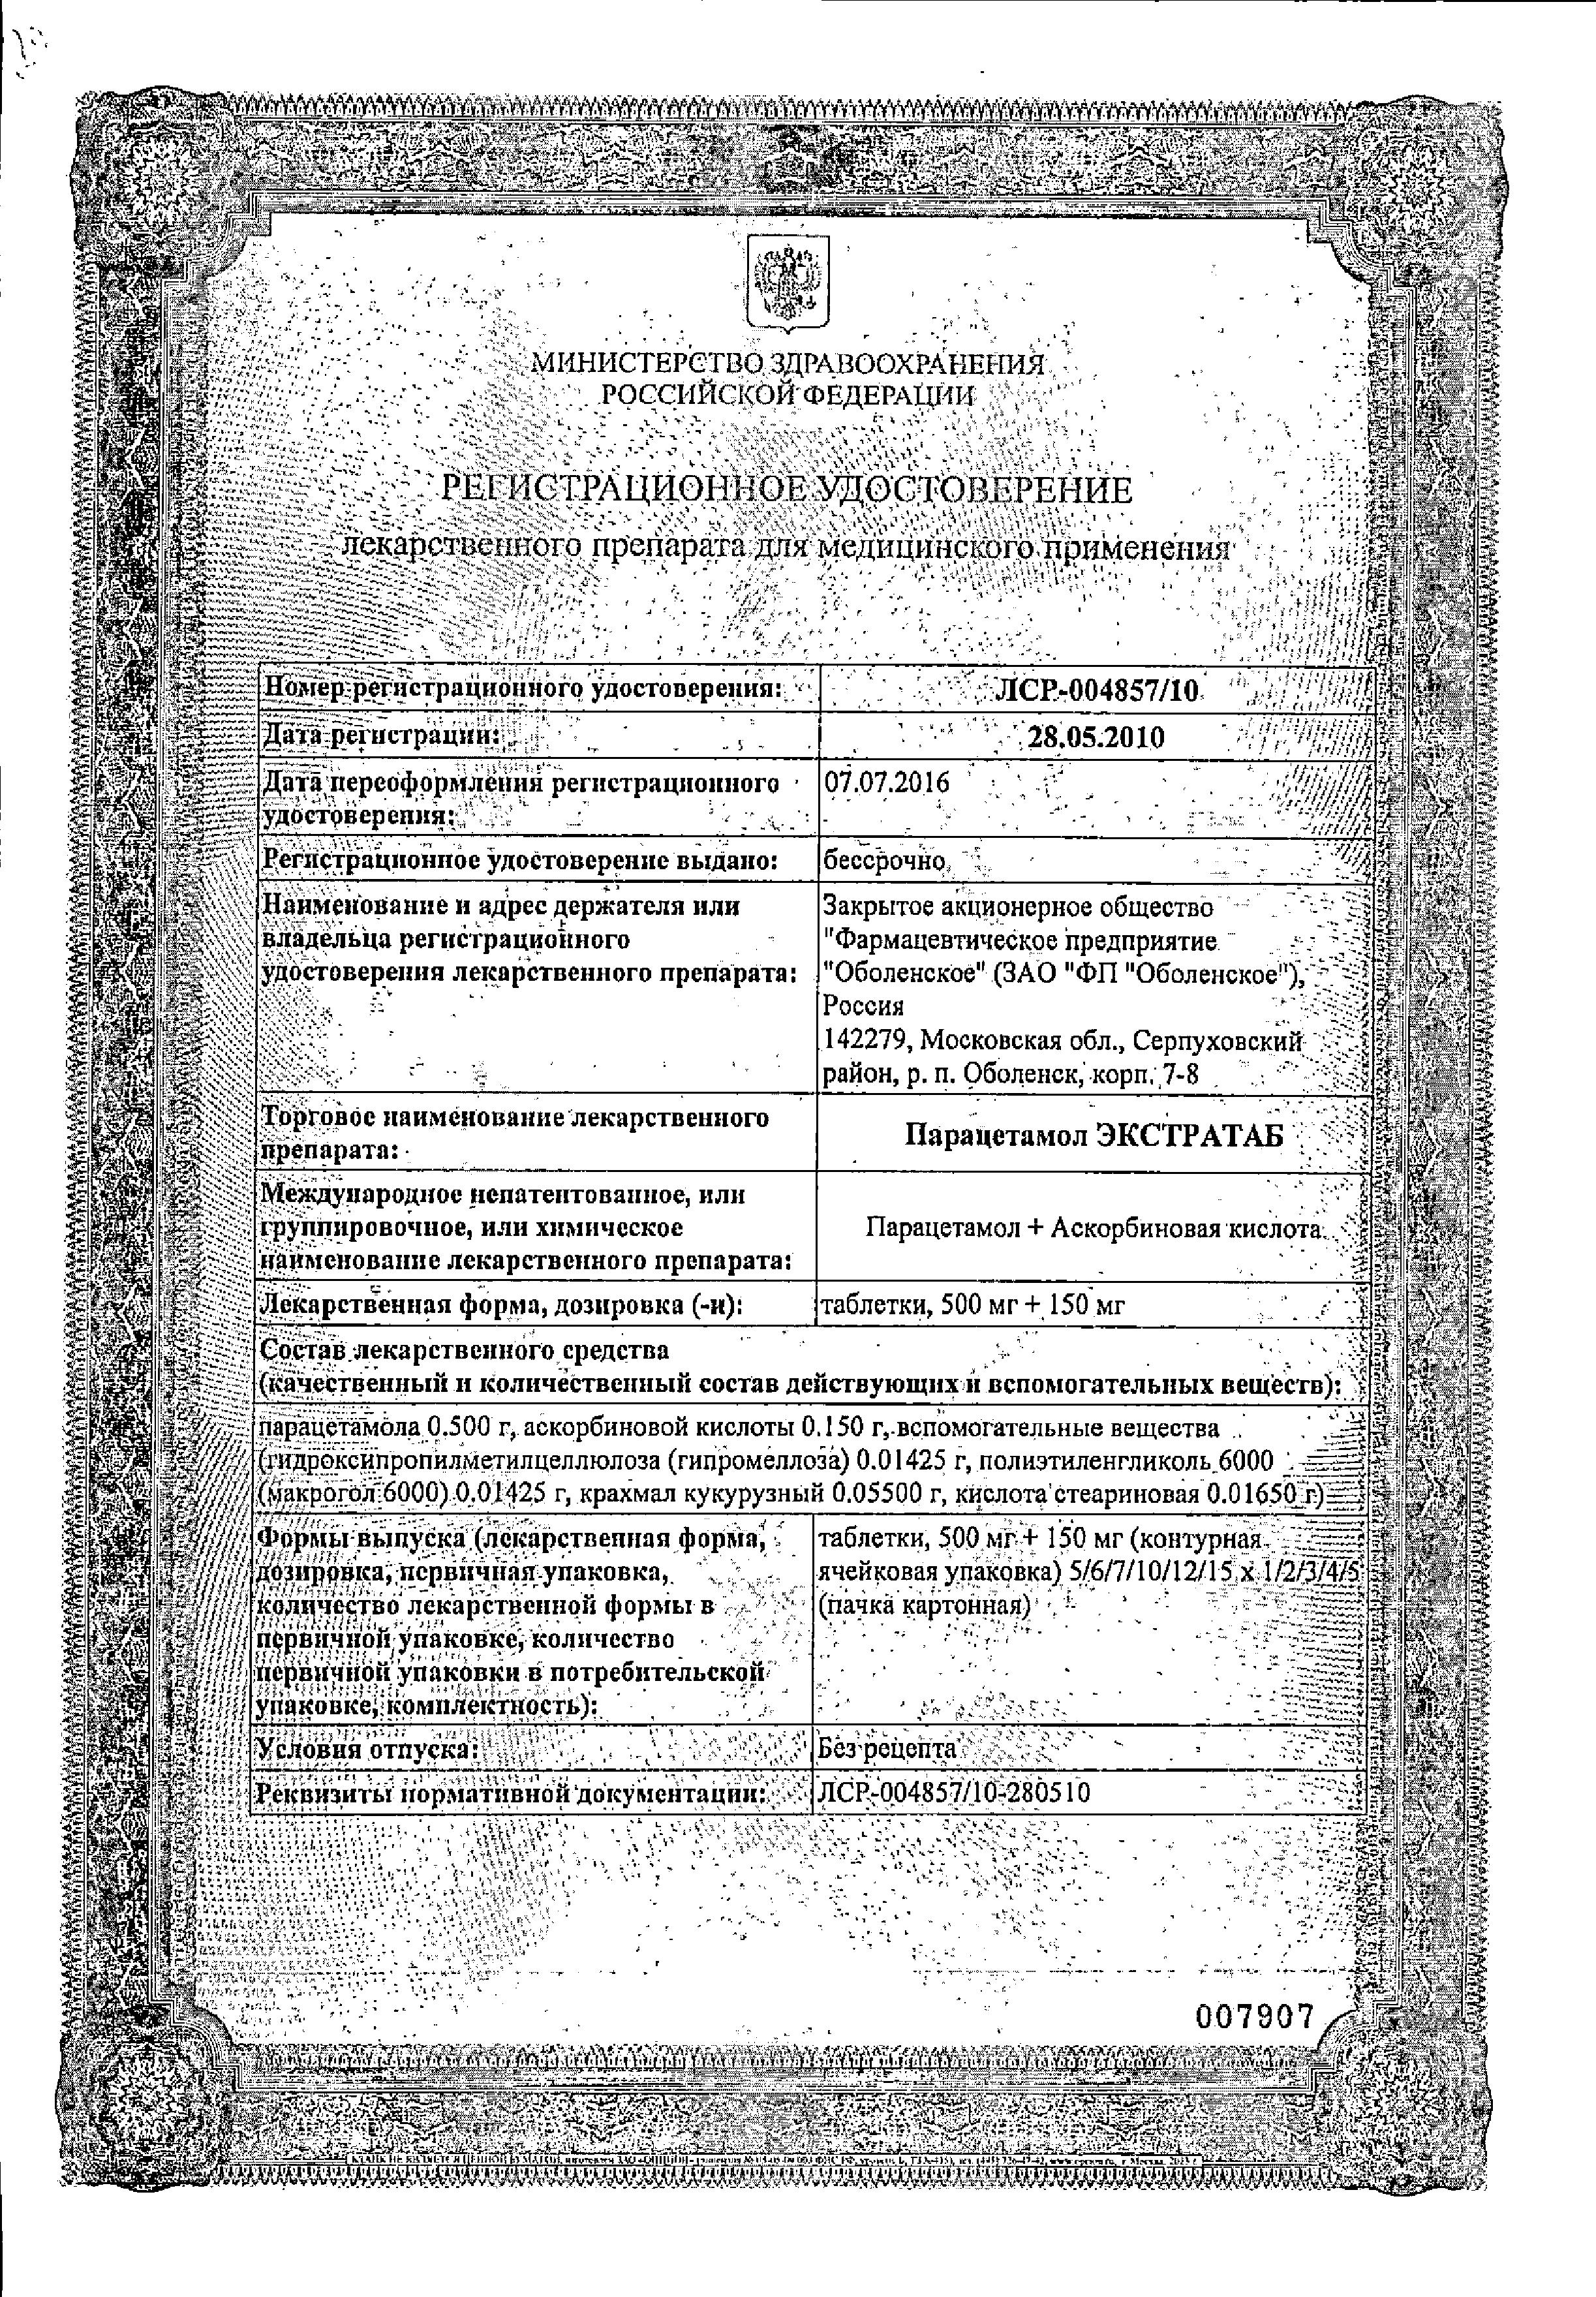 Парацетамол Экстратаб сертификат